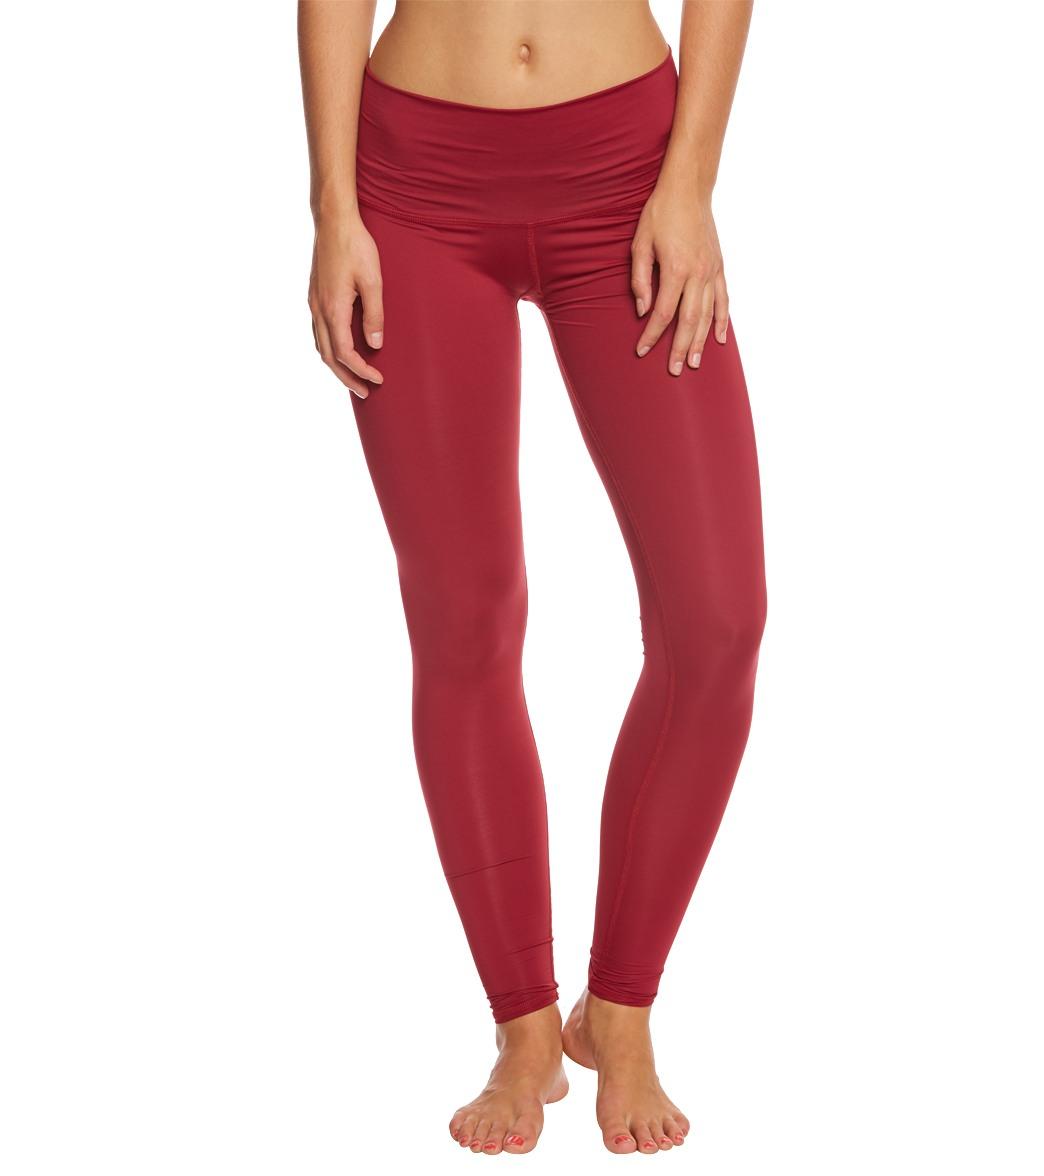 Teeki Burgundy Hot Yoga Pants At YogaOutlet.com